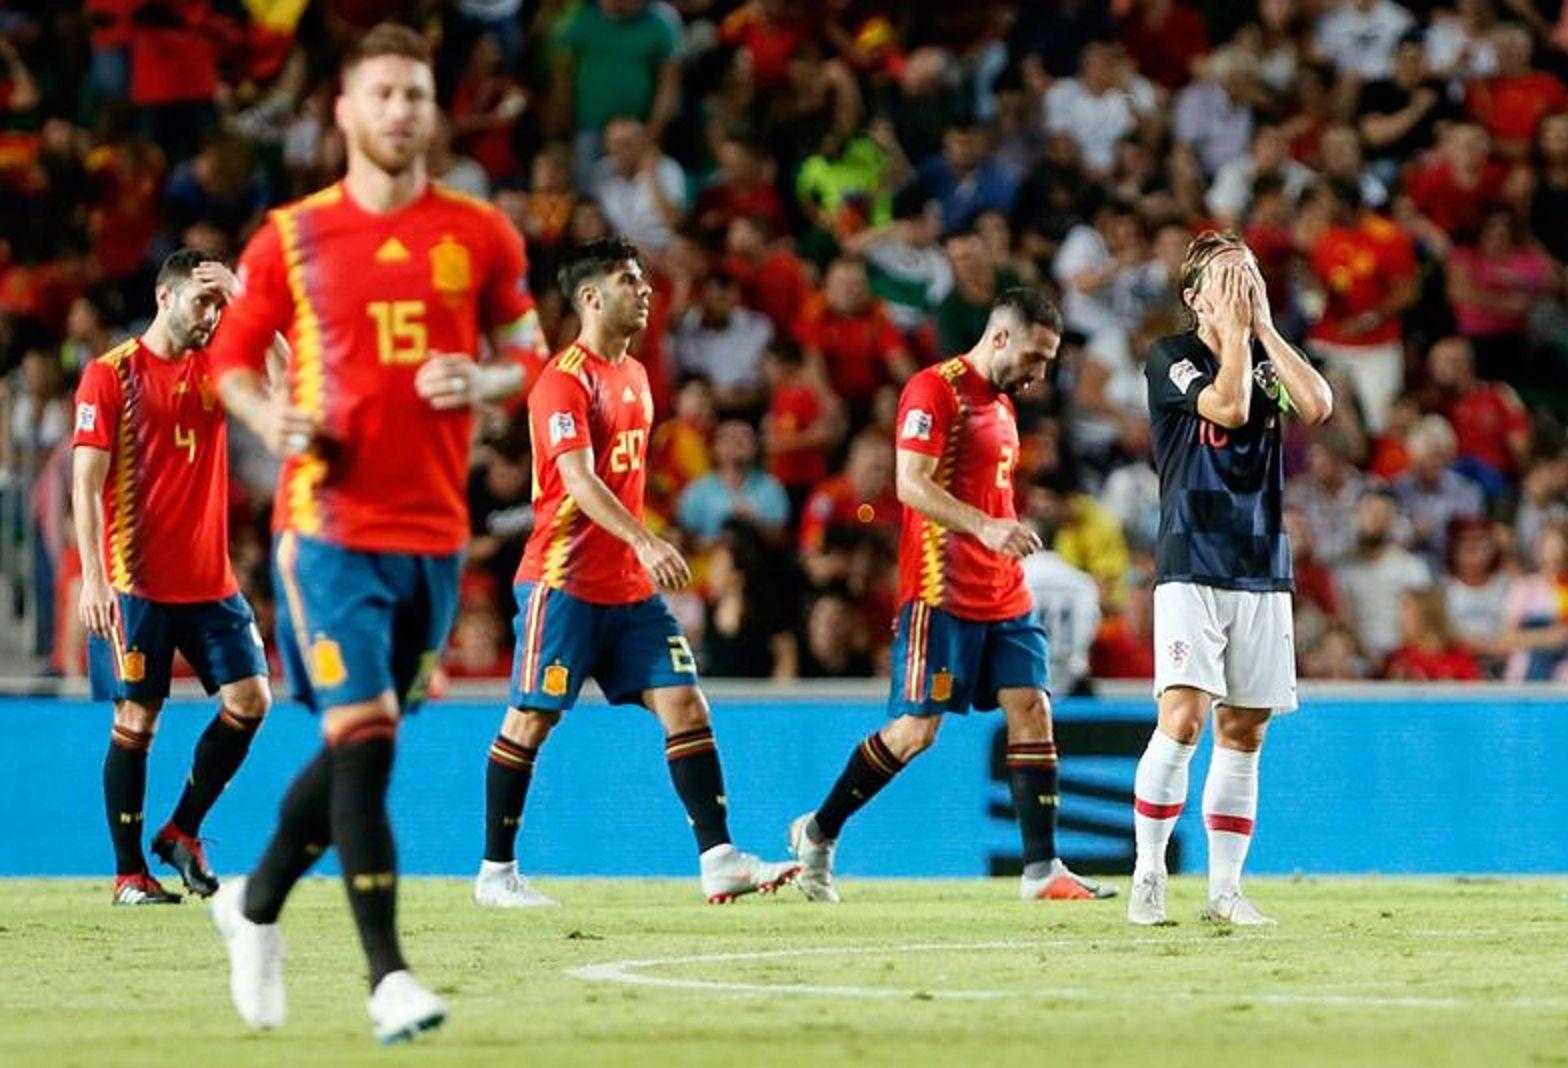 España le dio una lección de fútbol a Croacia